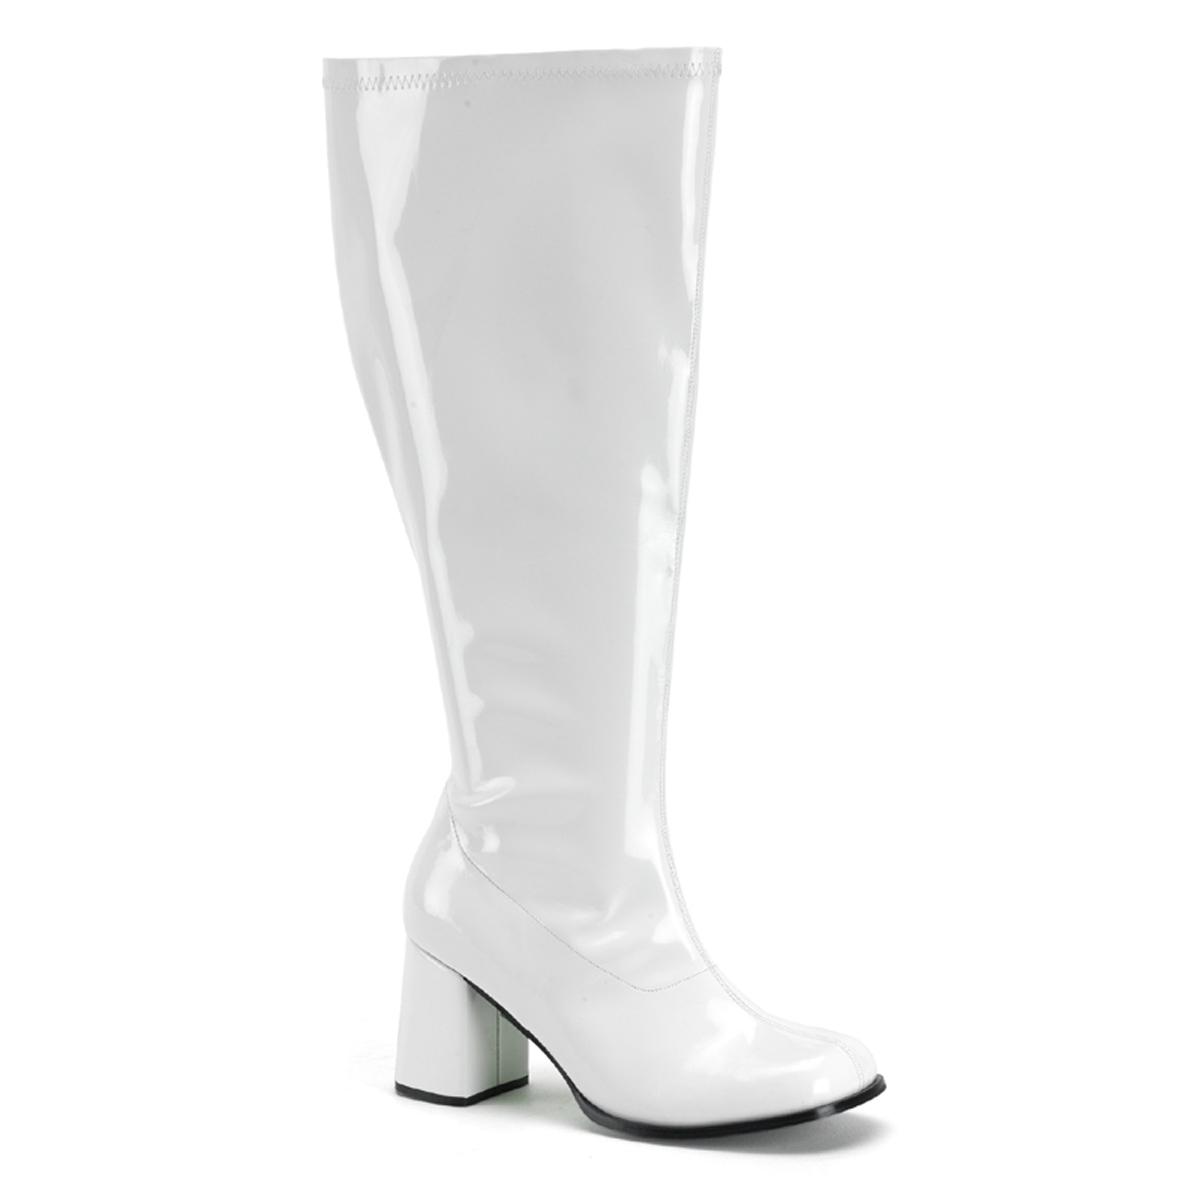 Pleaser Stiefel GOGO-300WC - PU Weiß 36 EU